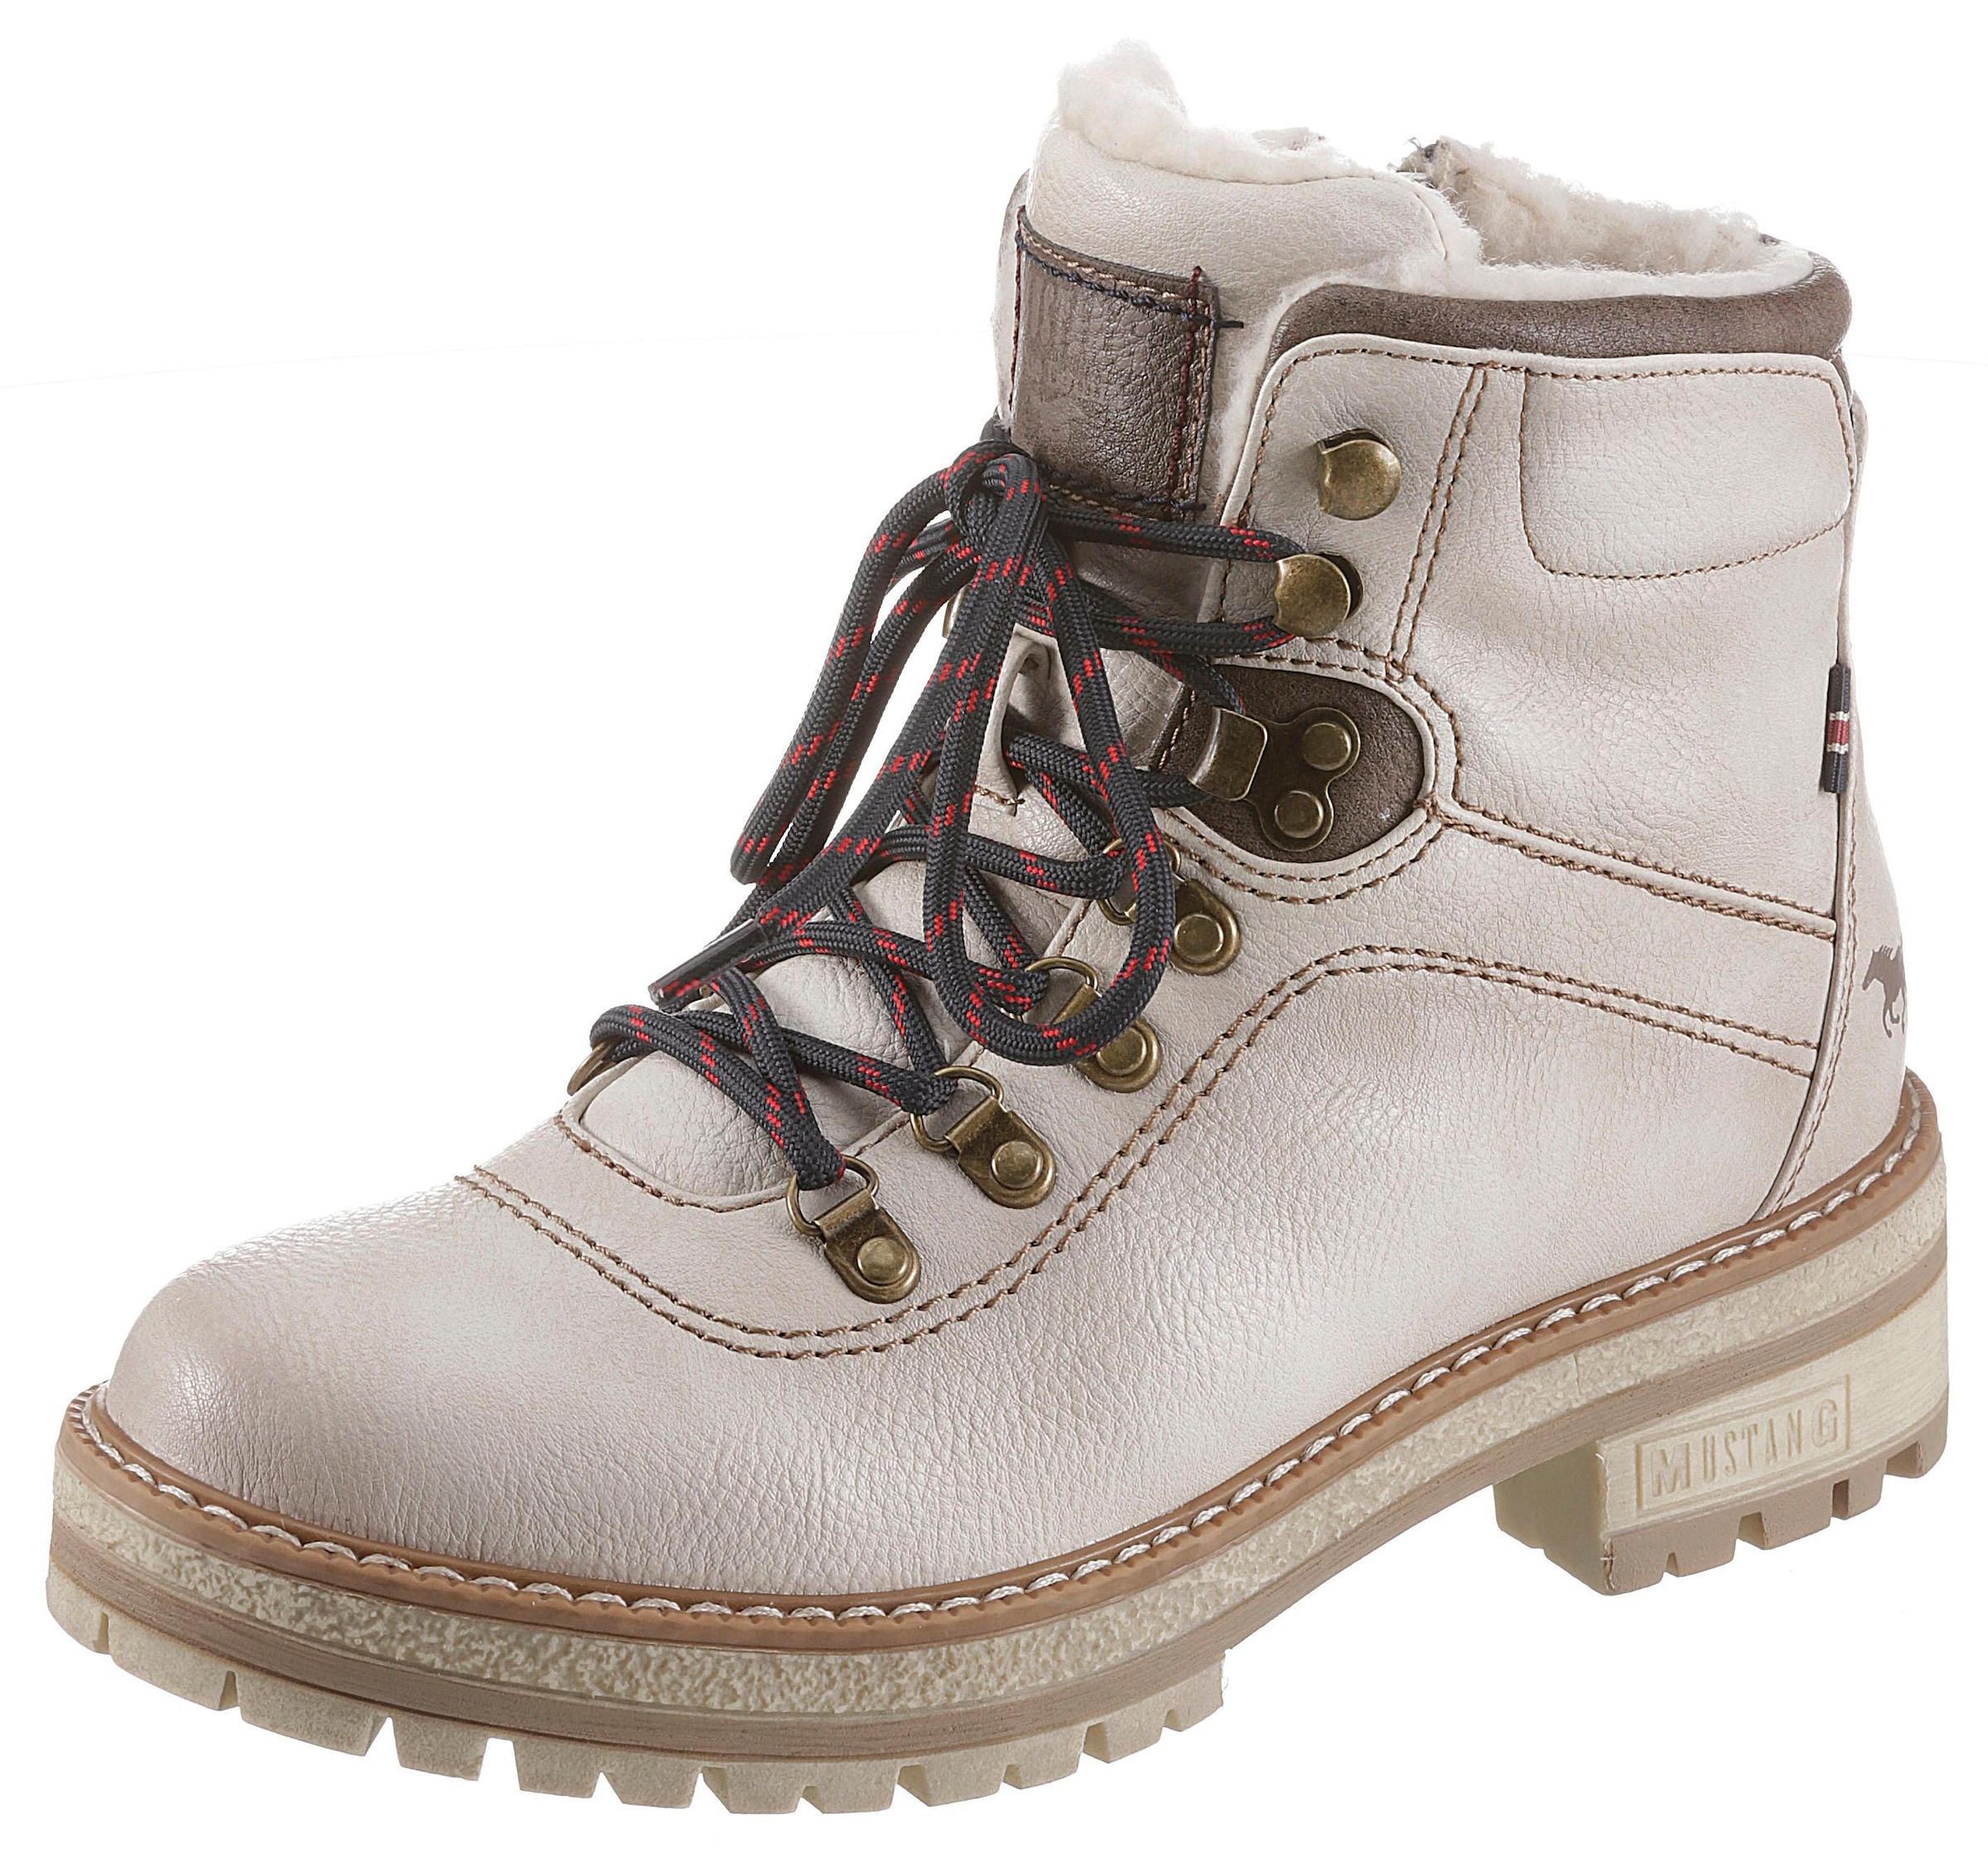 Mustang Shoes Winterboots online bei BAUR